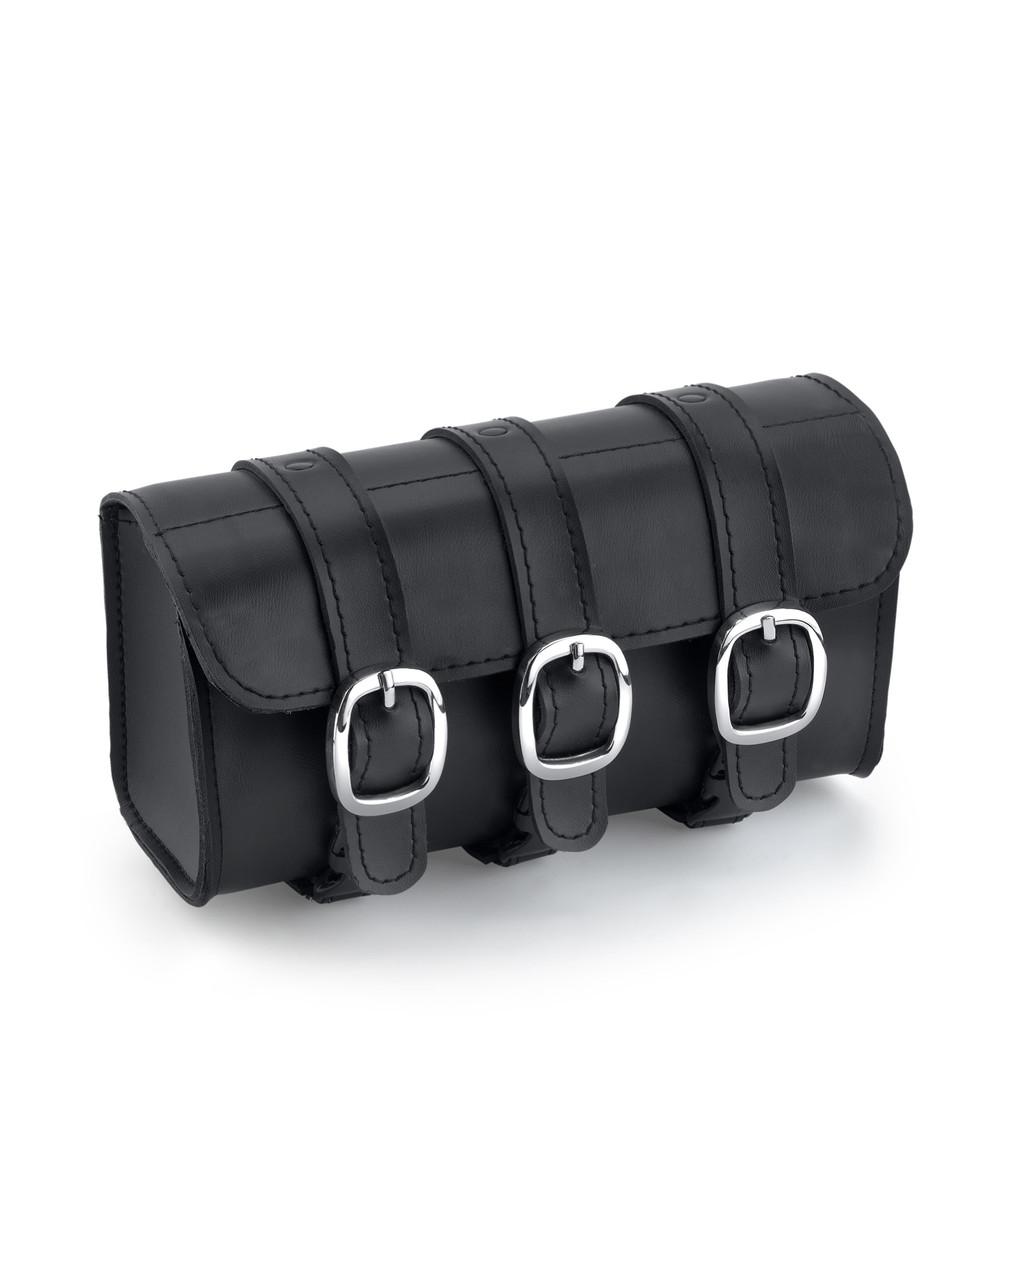 Trianon Plain Motorcycle Tool Bag Main Bag Image